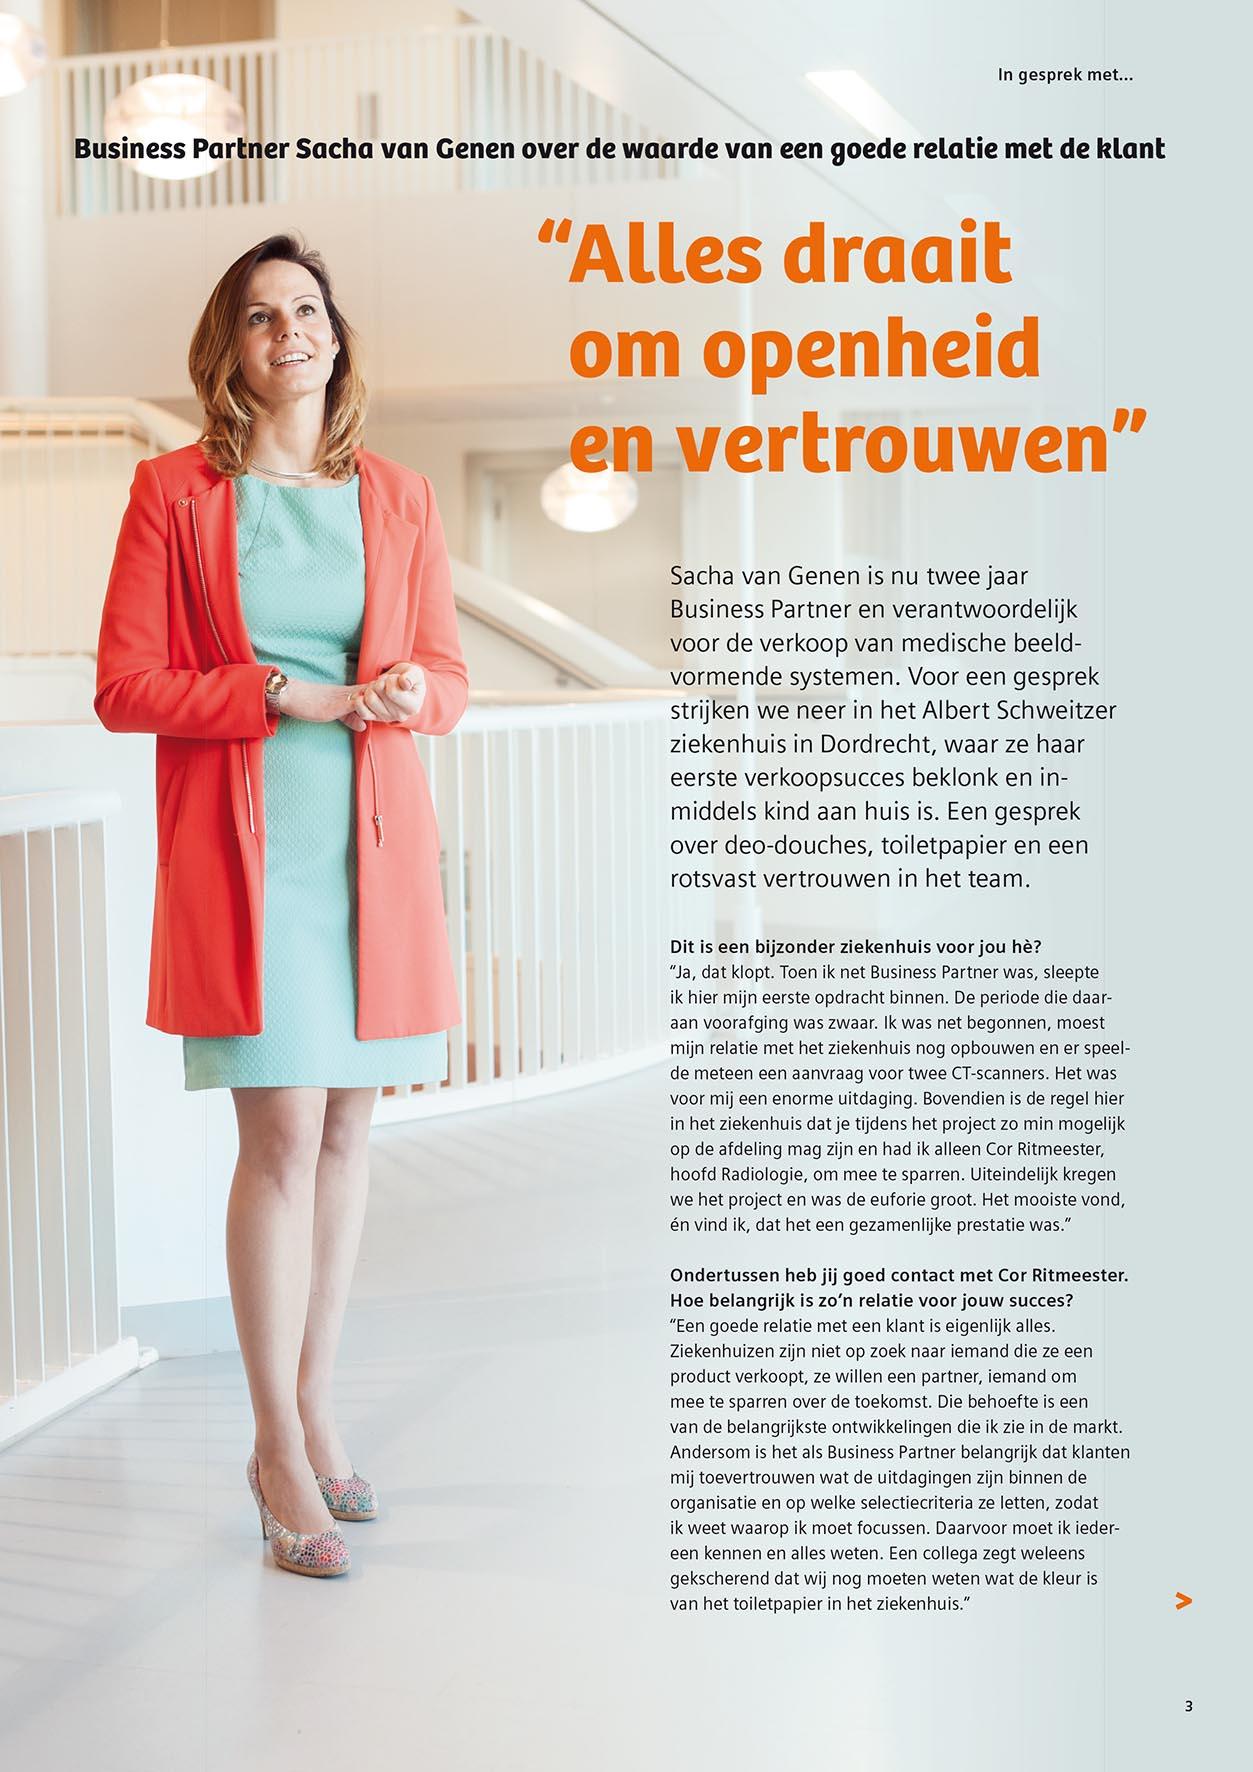 Siemens Healthy Now